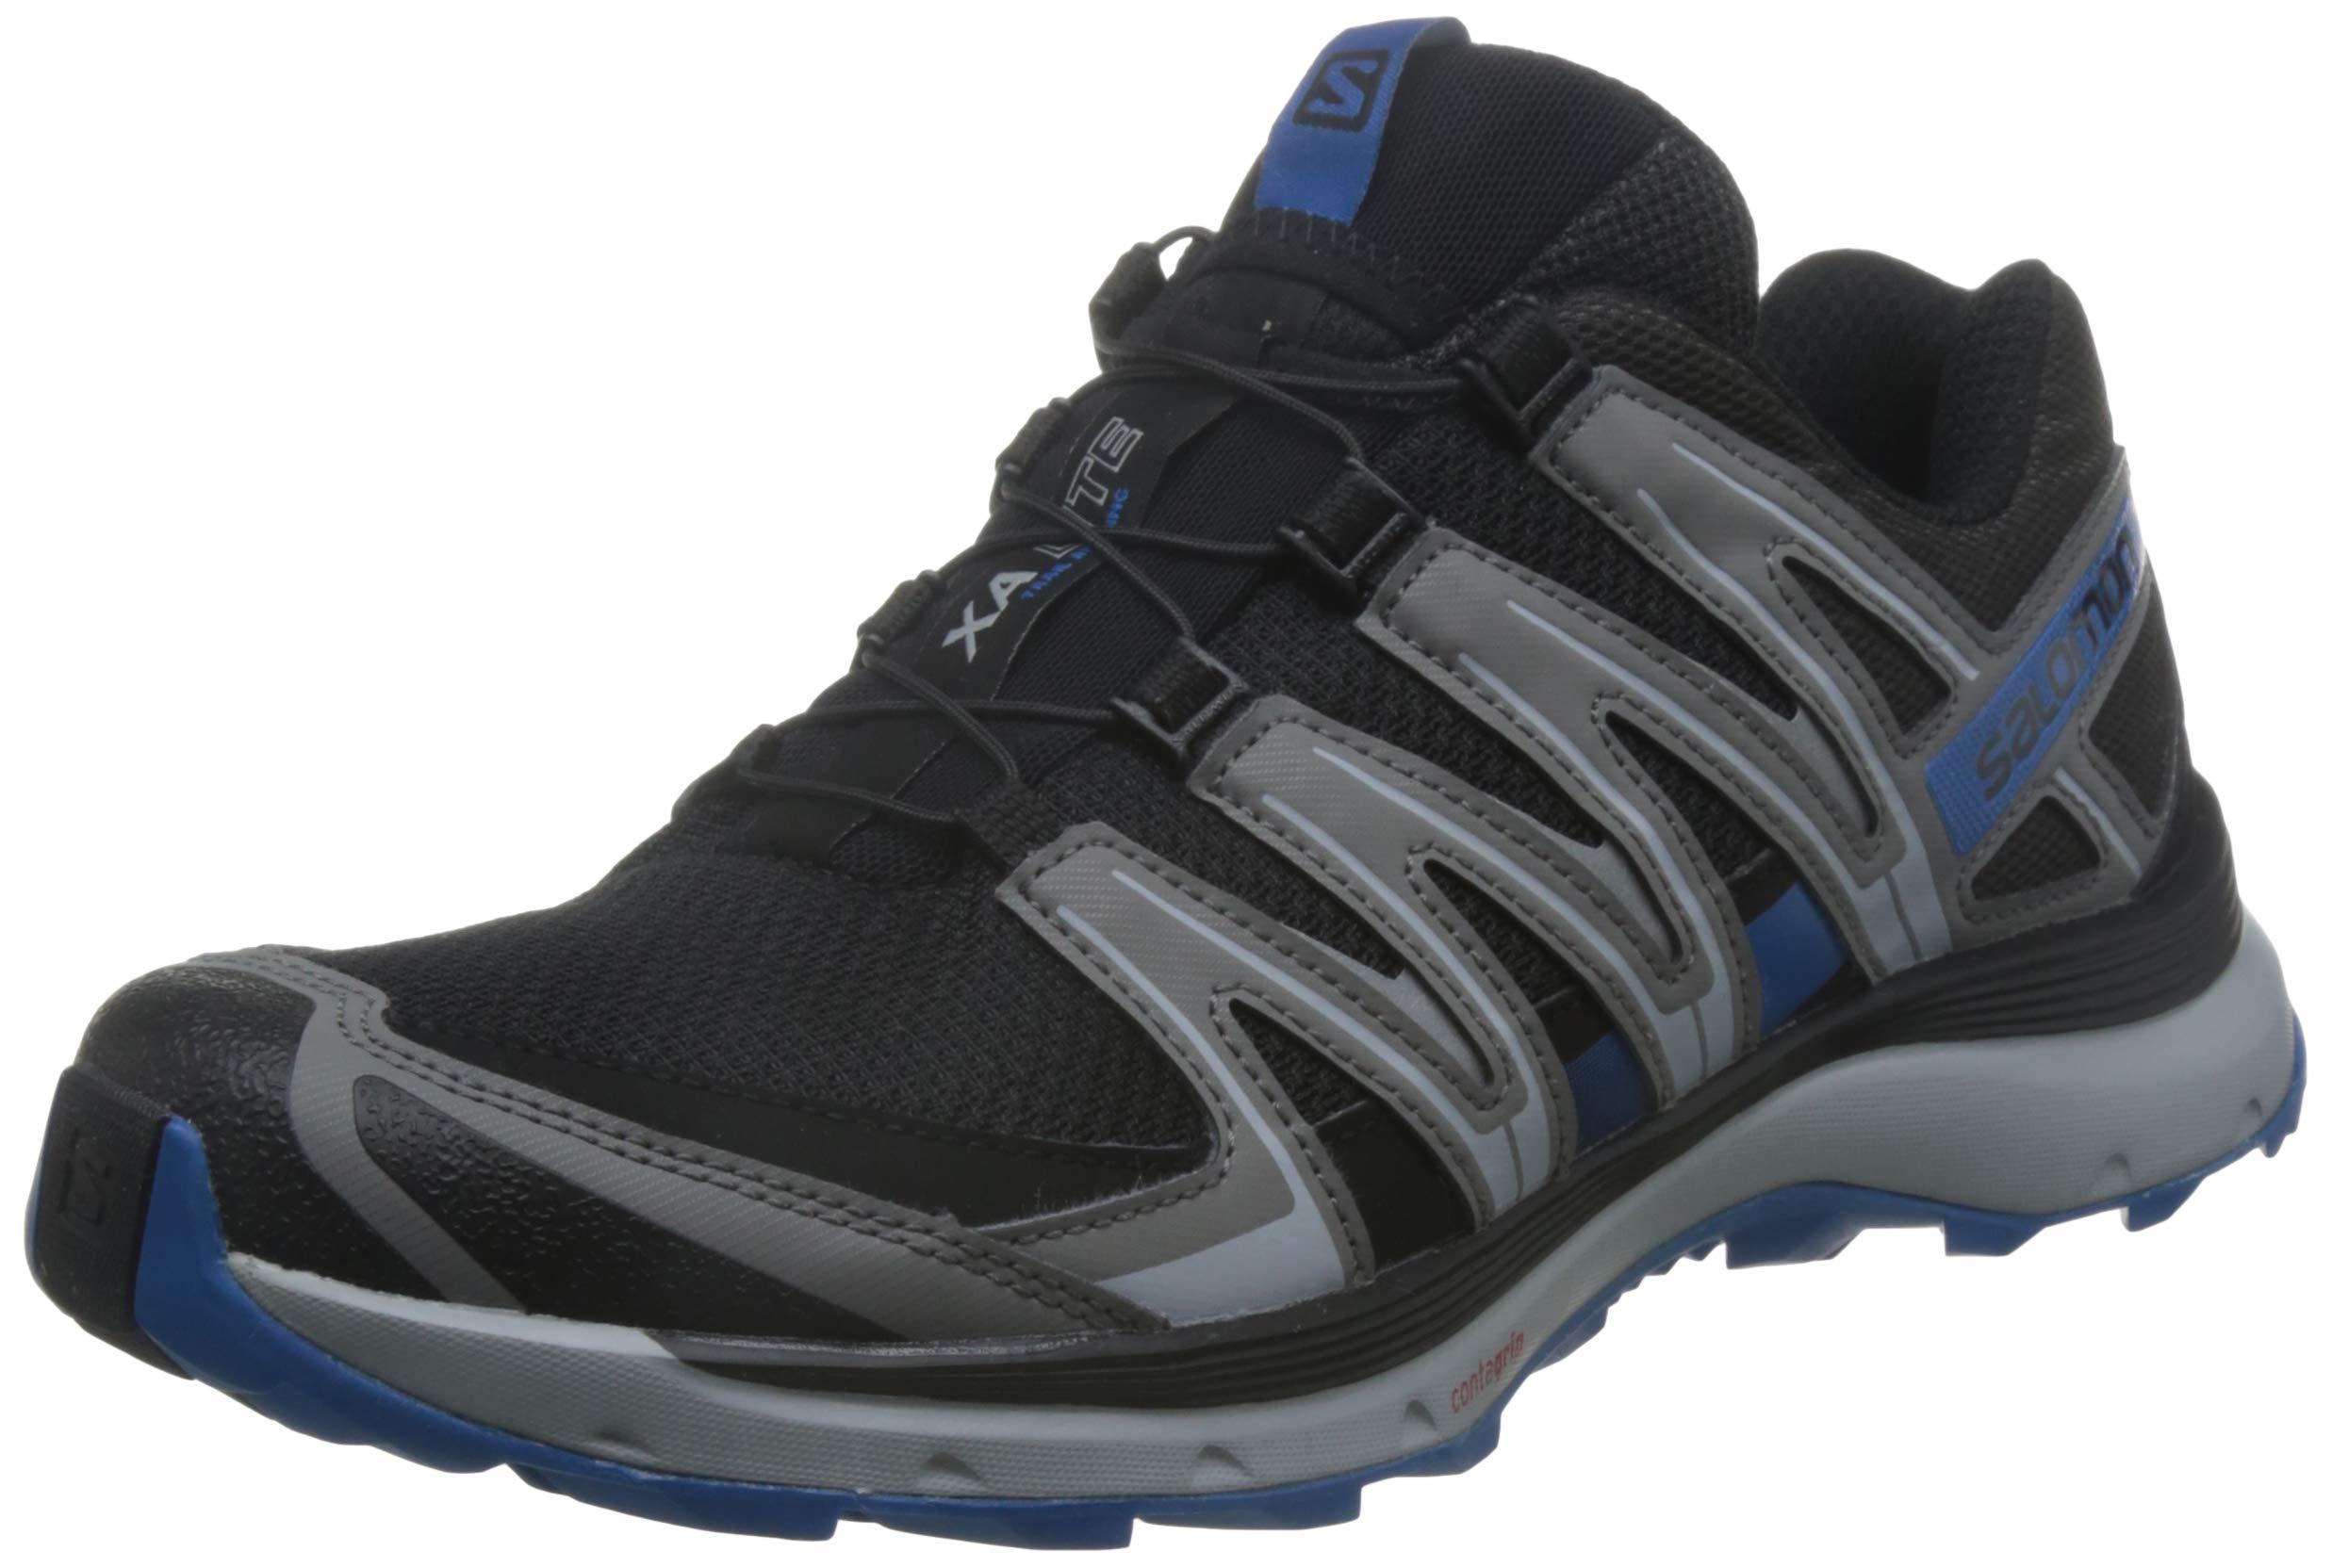 Salomon Herren Xa Lite Trailrunning-Schuhe, Schwarz/Blau (black/quiet shade/impe